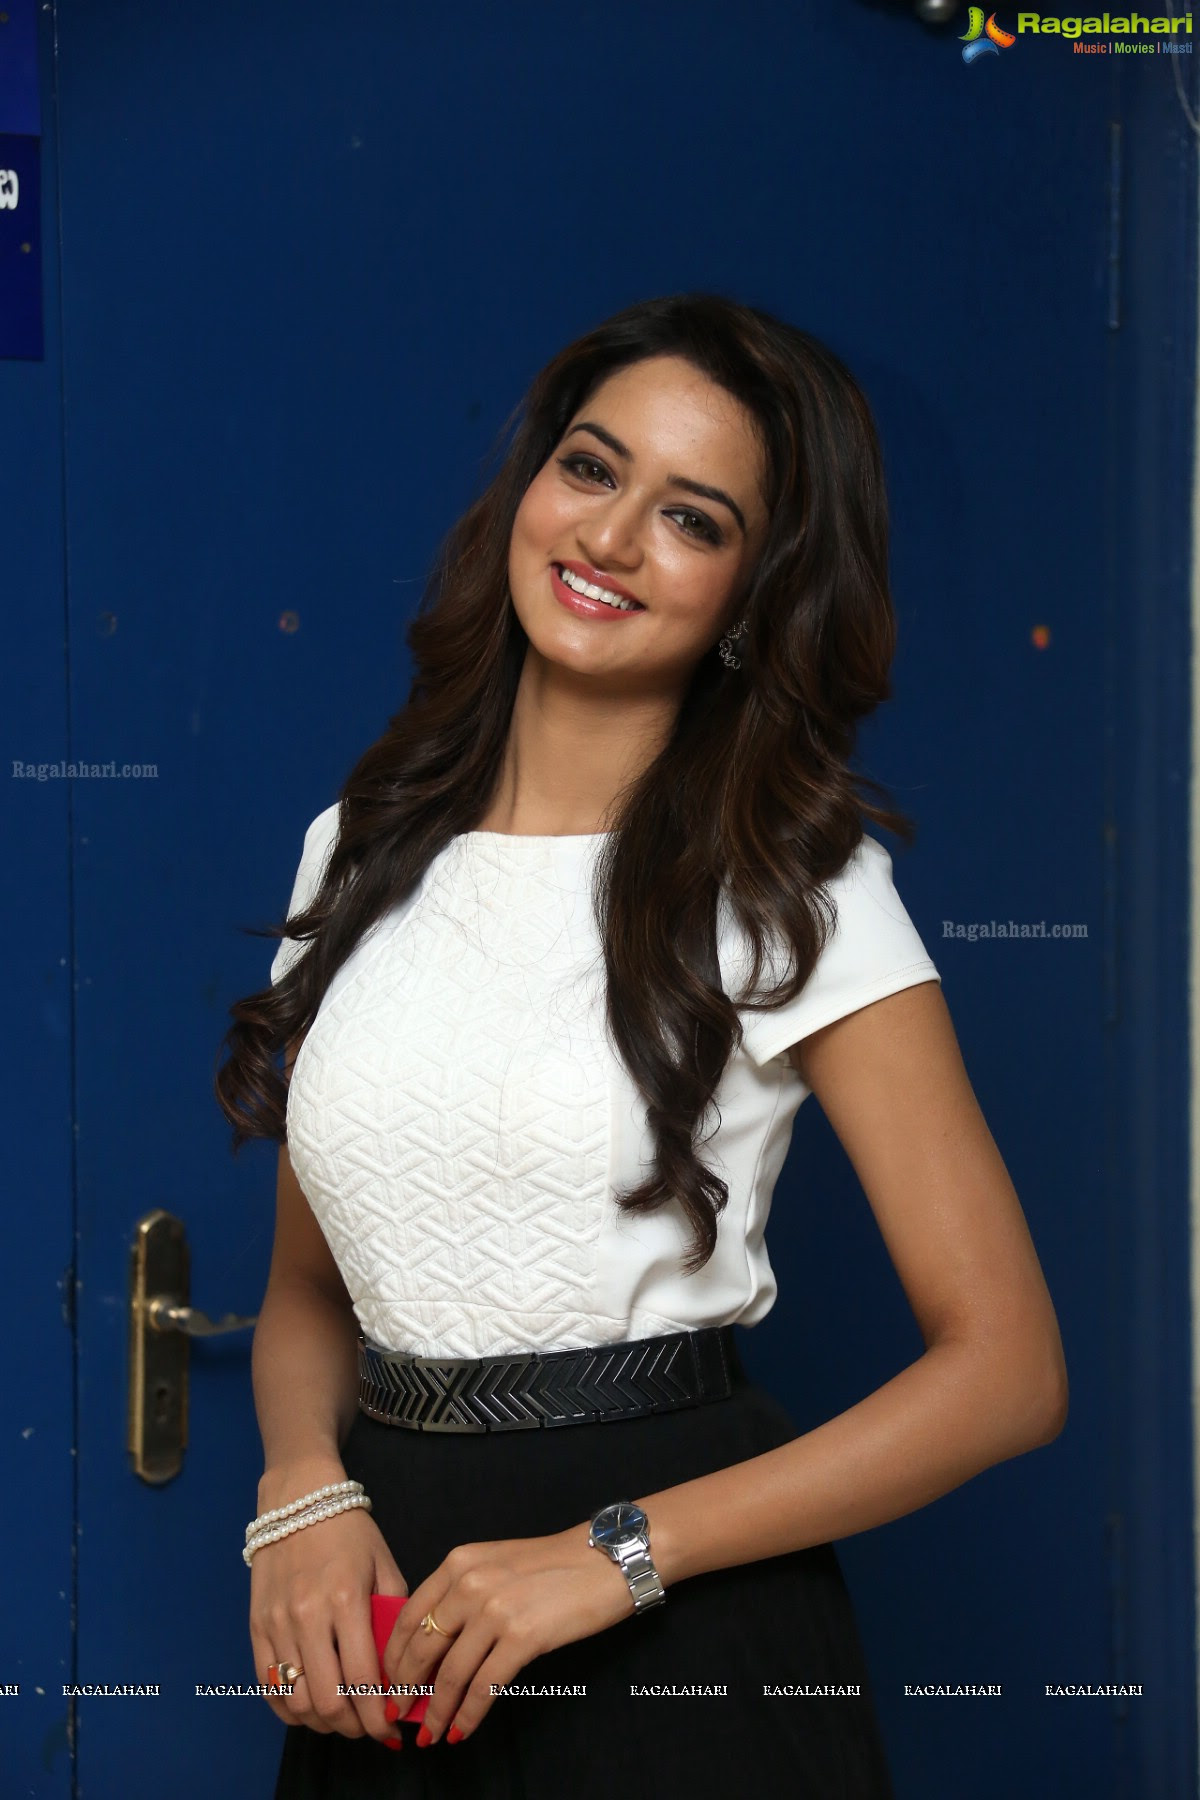 Shanvi Ragalahari / Beautiful Actress Shanvi Srivastava ...